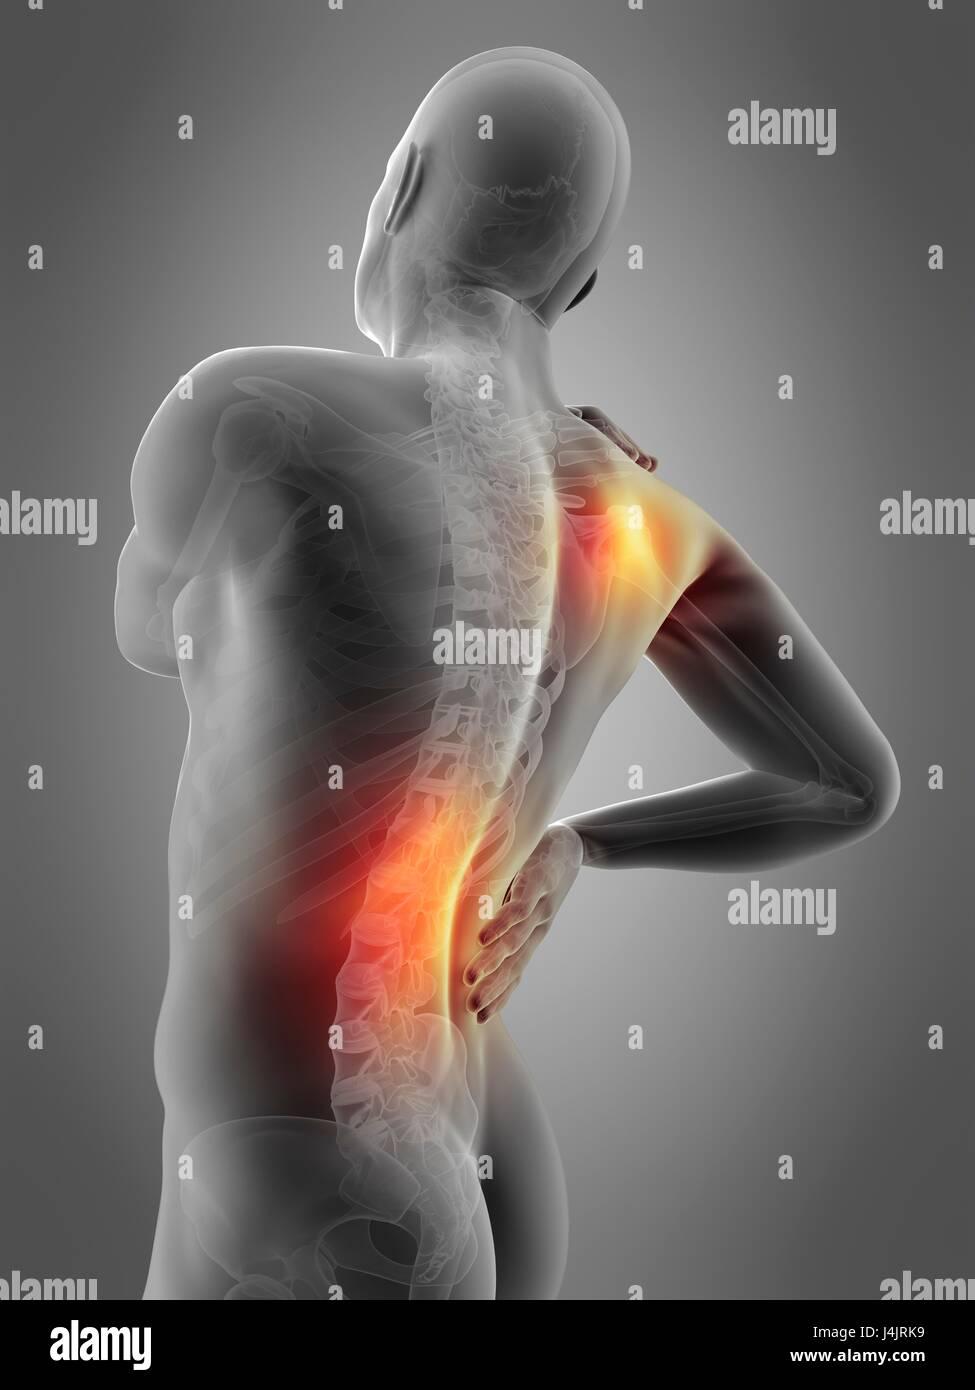 Skeletal Structure Of Human Shoulder And Waist Pain Illustration